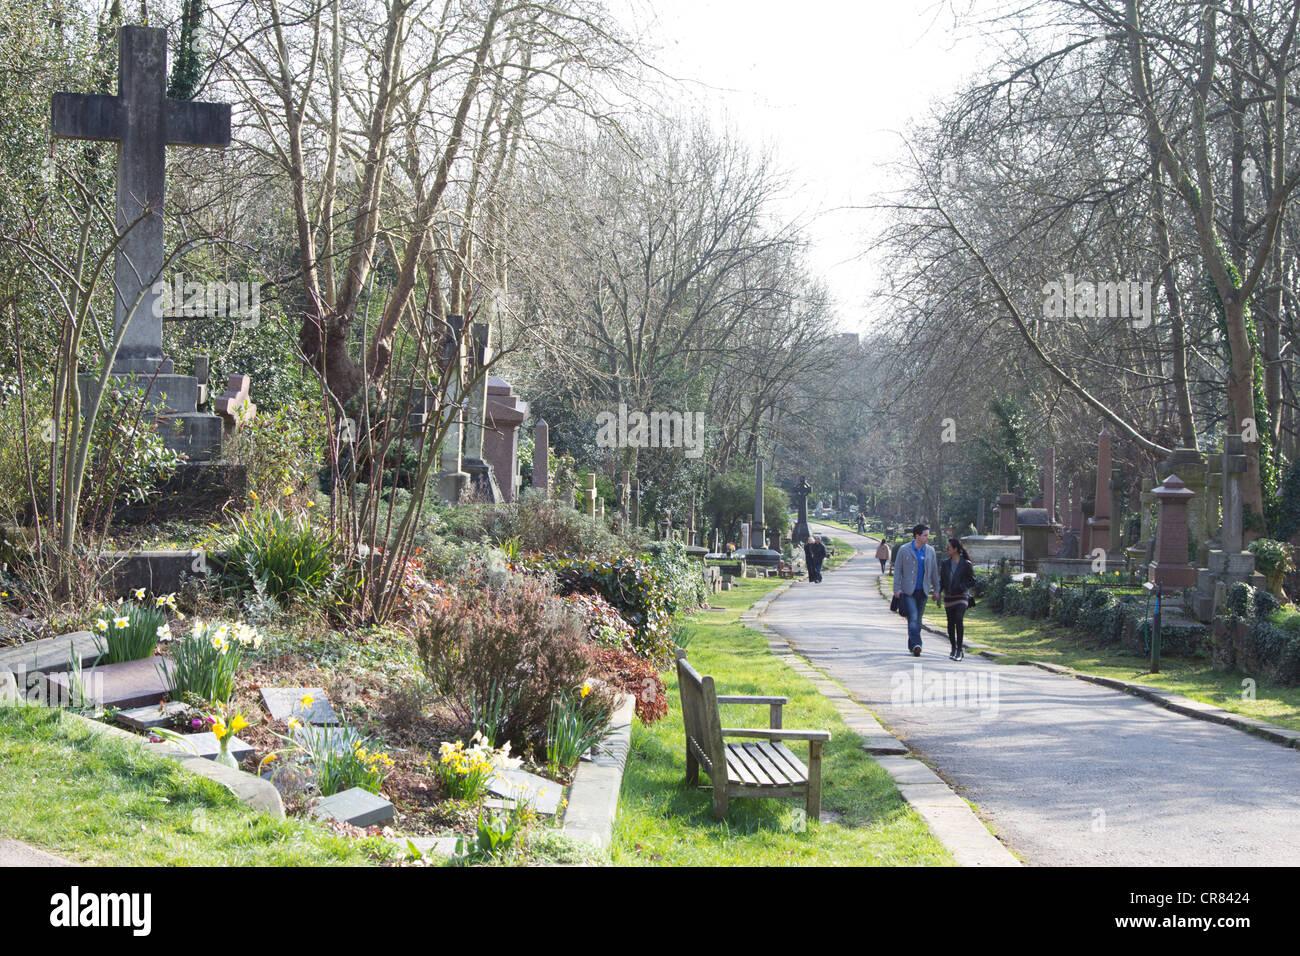 Highgate Cemetery - Camden - London - Stock Image